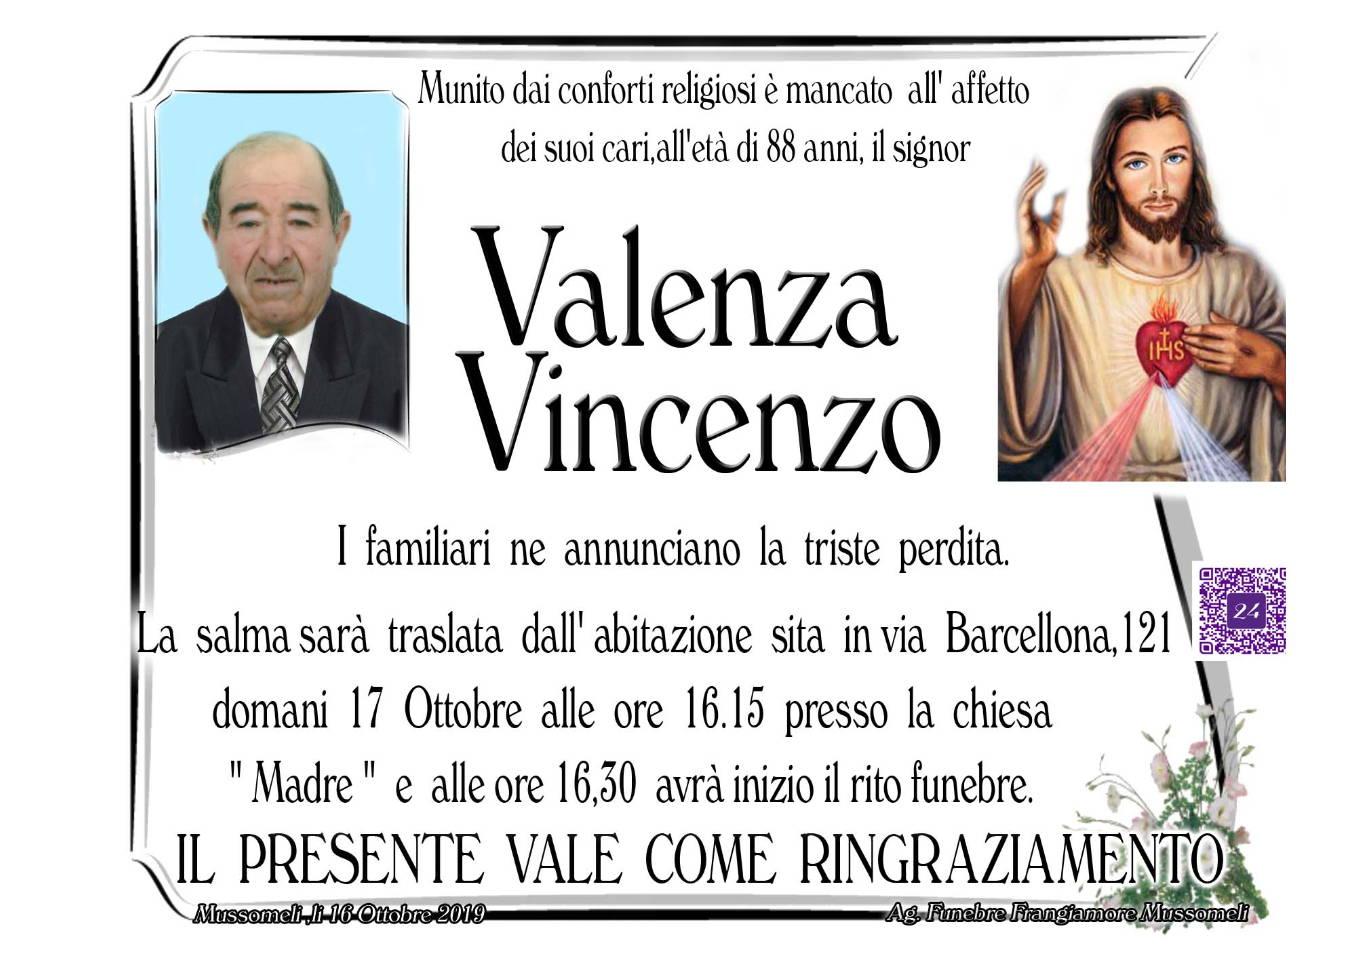 Vincenzo Valenza